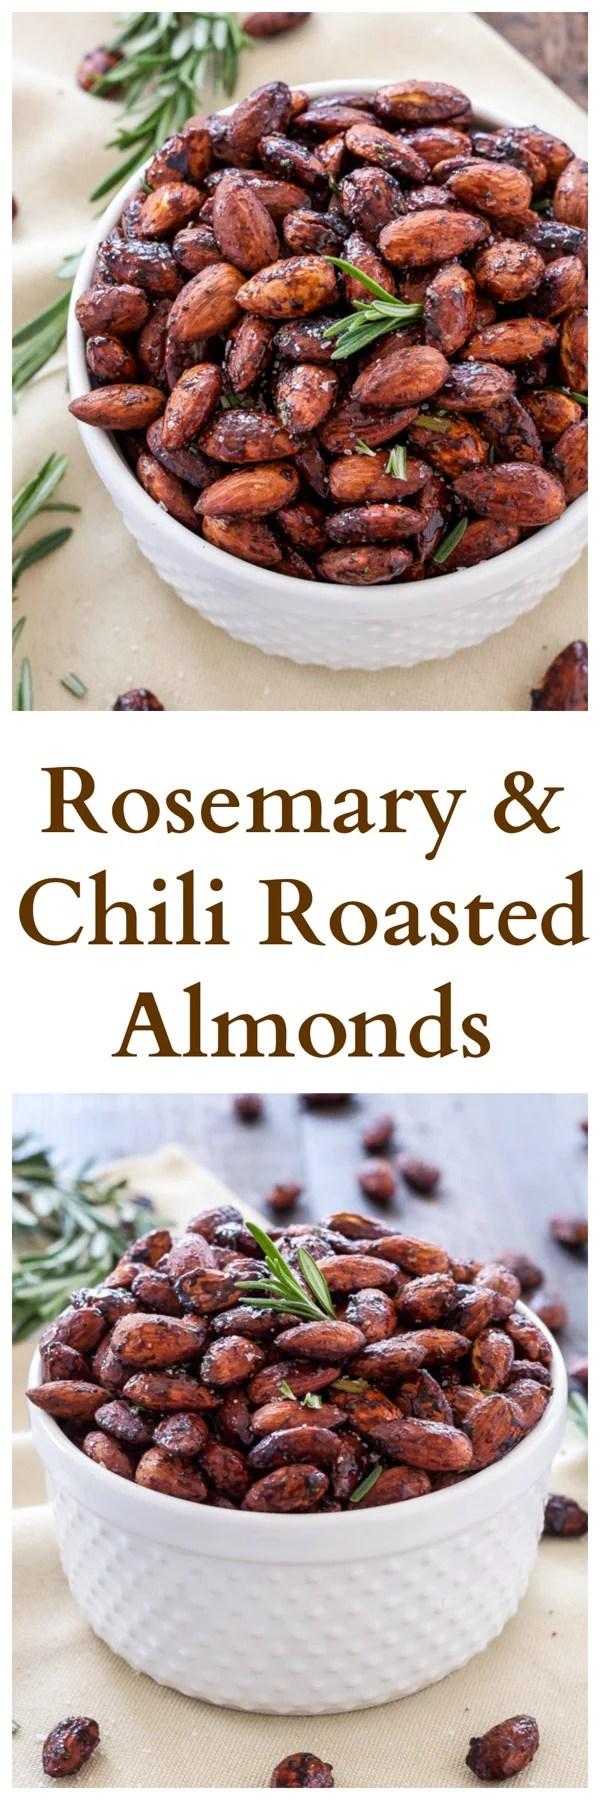 Rosemary and Chili Roasted Almonds Recipe Runner